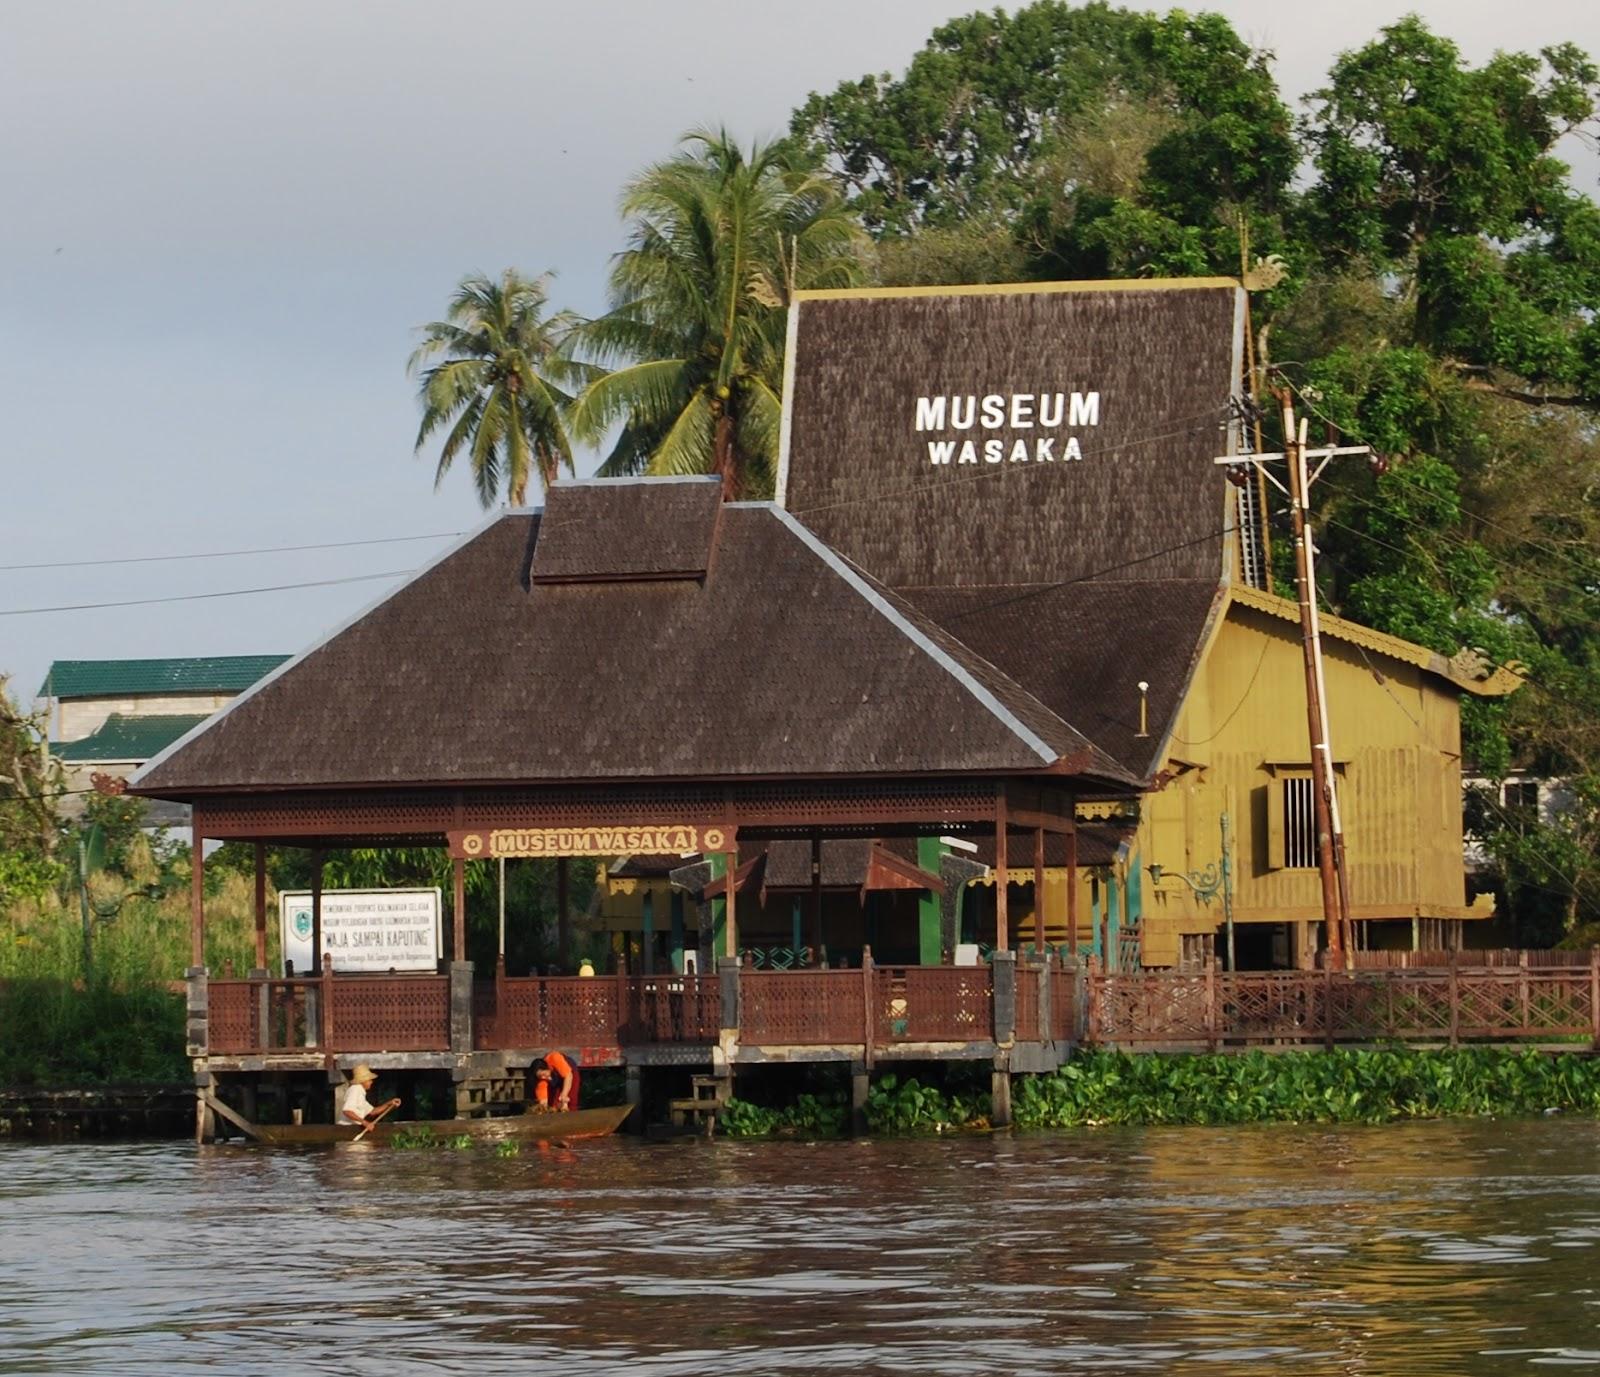 Museum Wasaka Menyimpan Kisah Perjuangan Rakyat Kalimantan